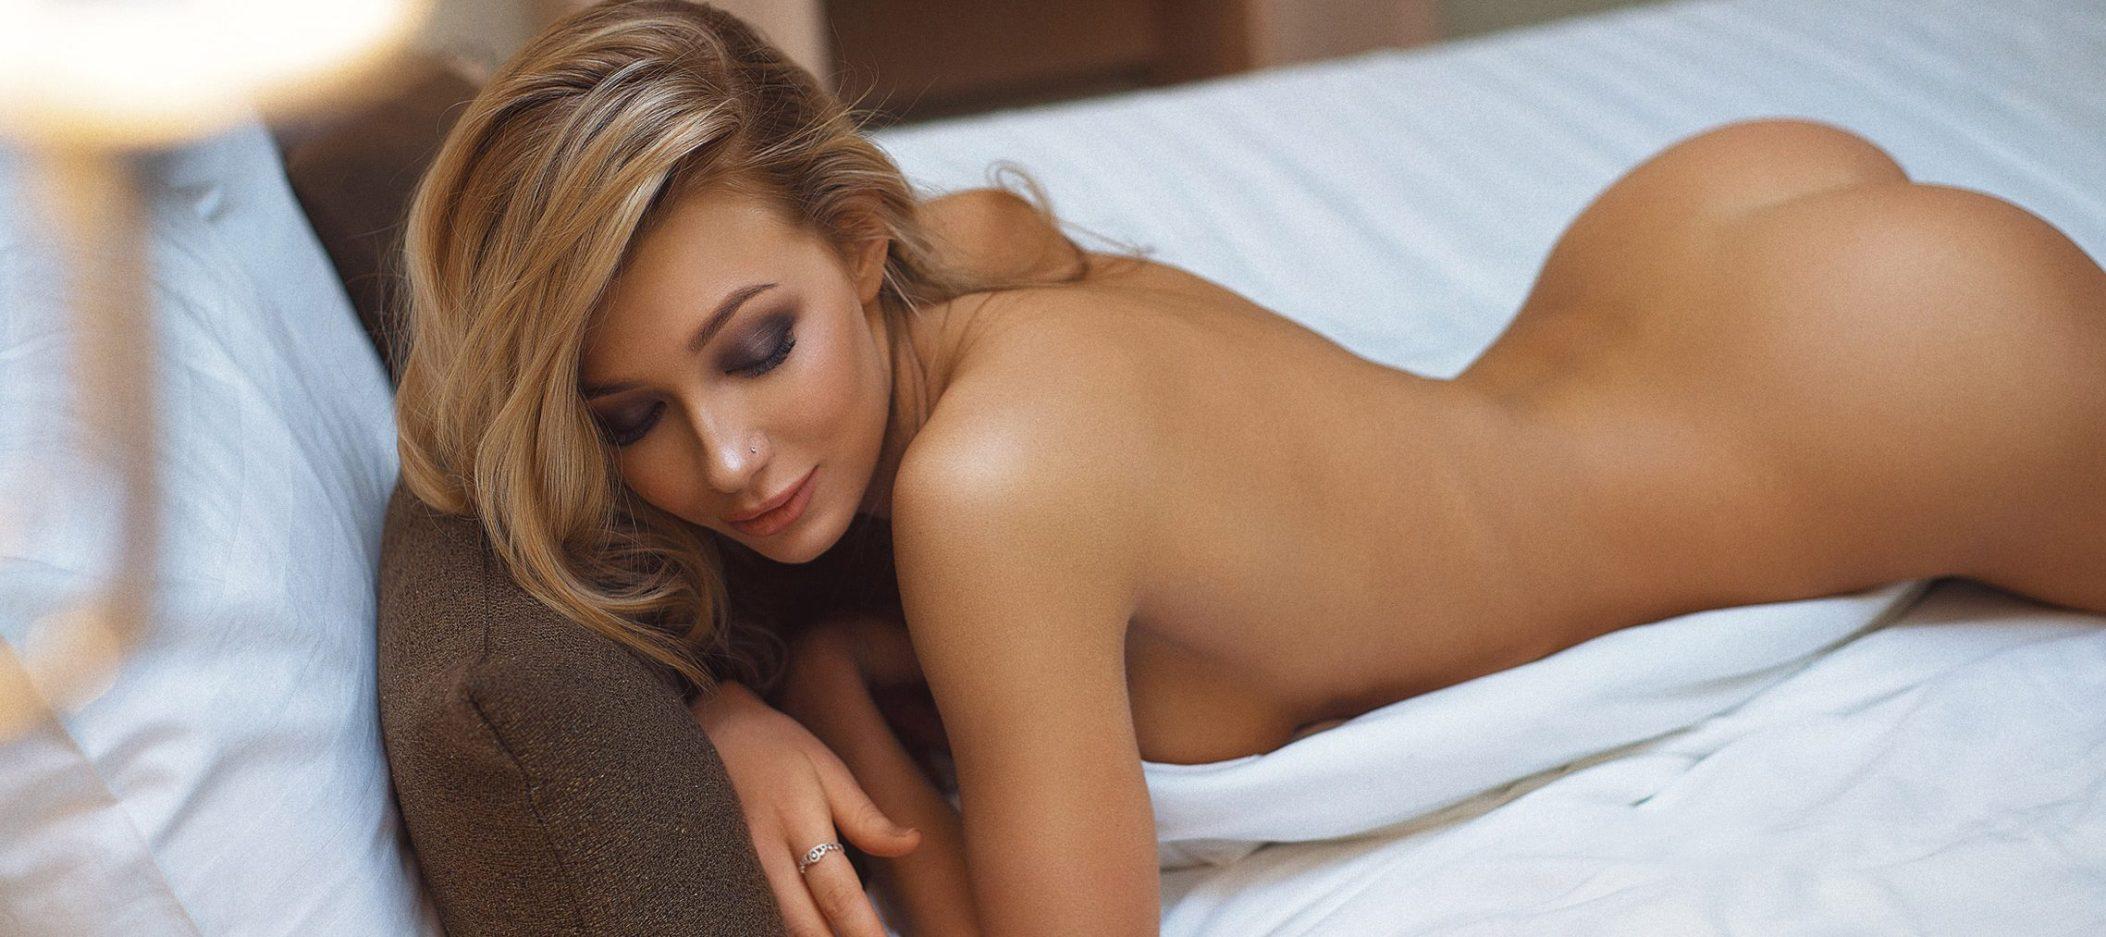 Gabriela Barros Nude tag: angelika lesik nude — portraits of girls